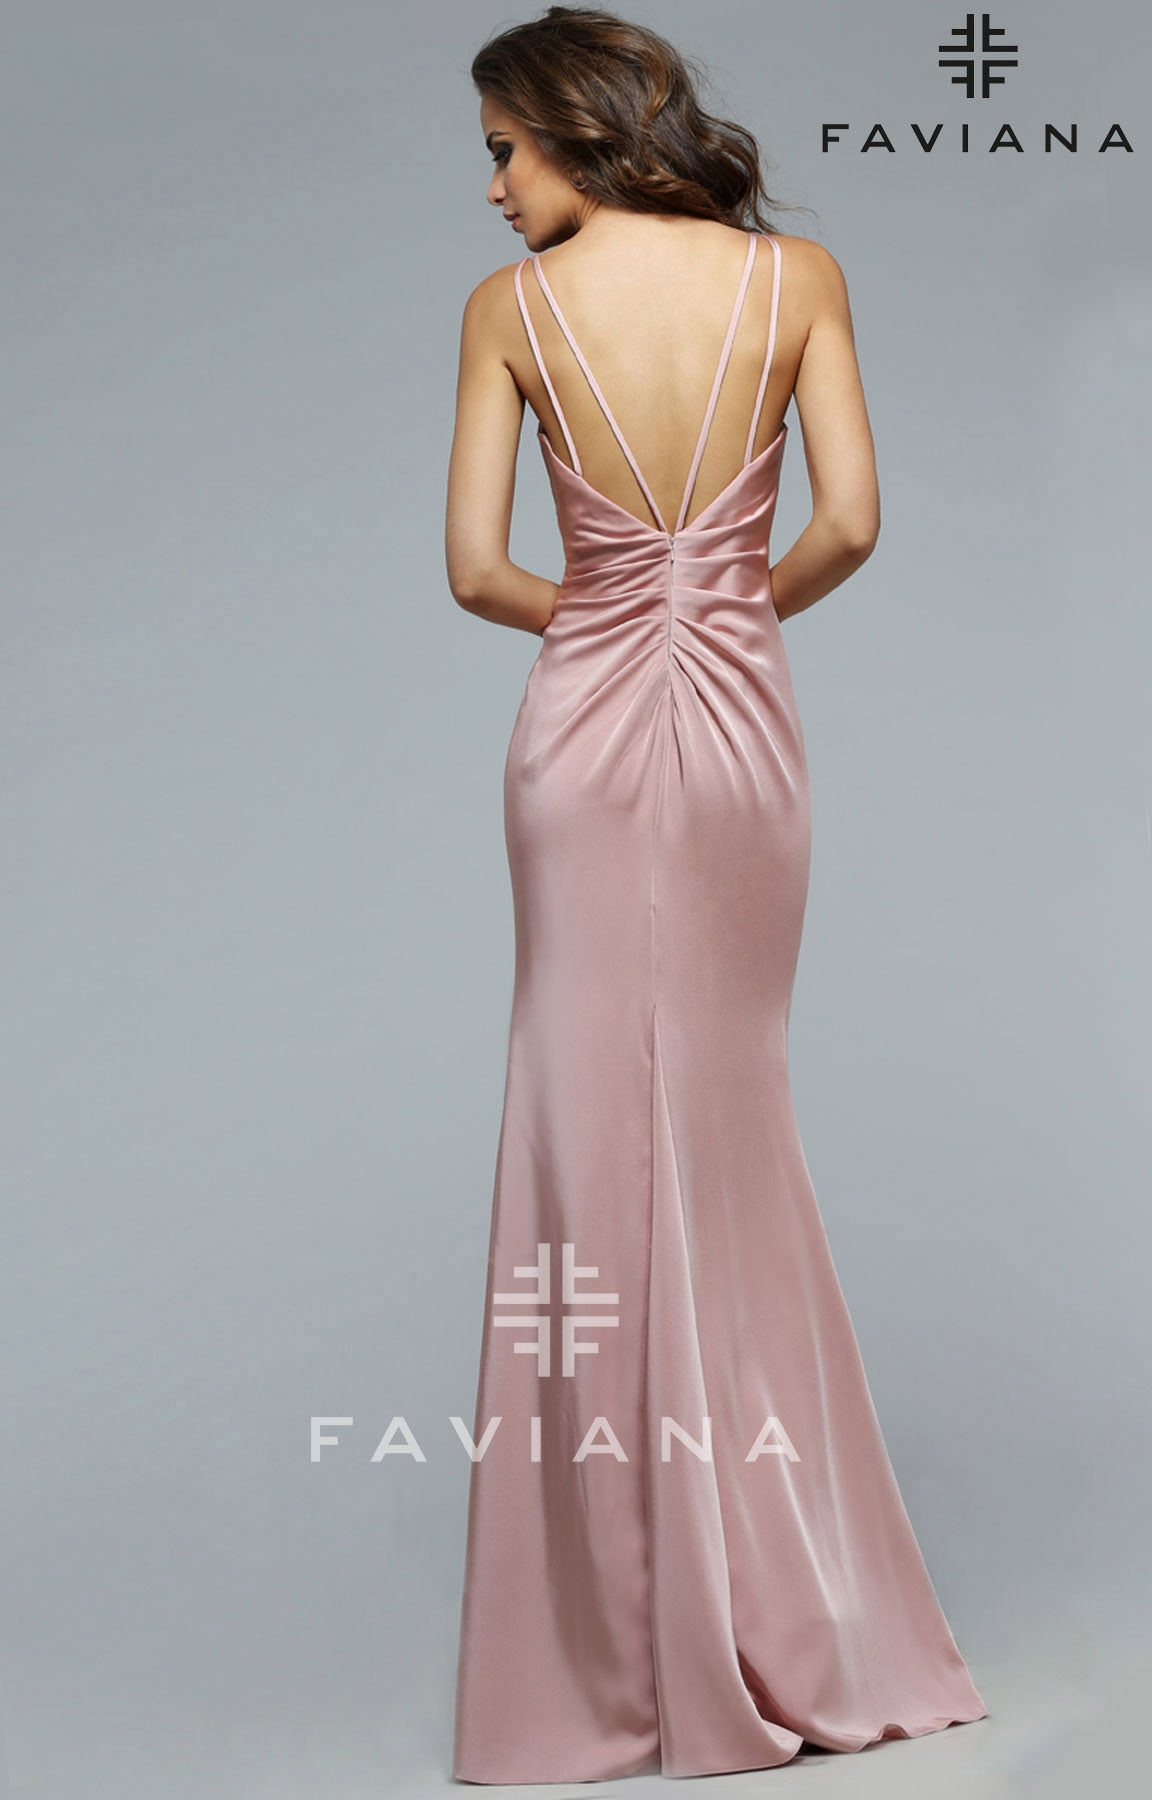 Faviana 7755e Dusty Rose Dress Prom Dress